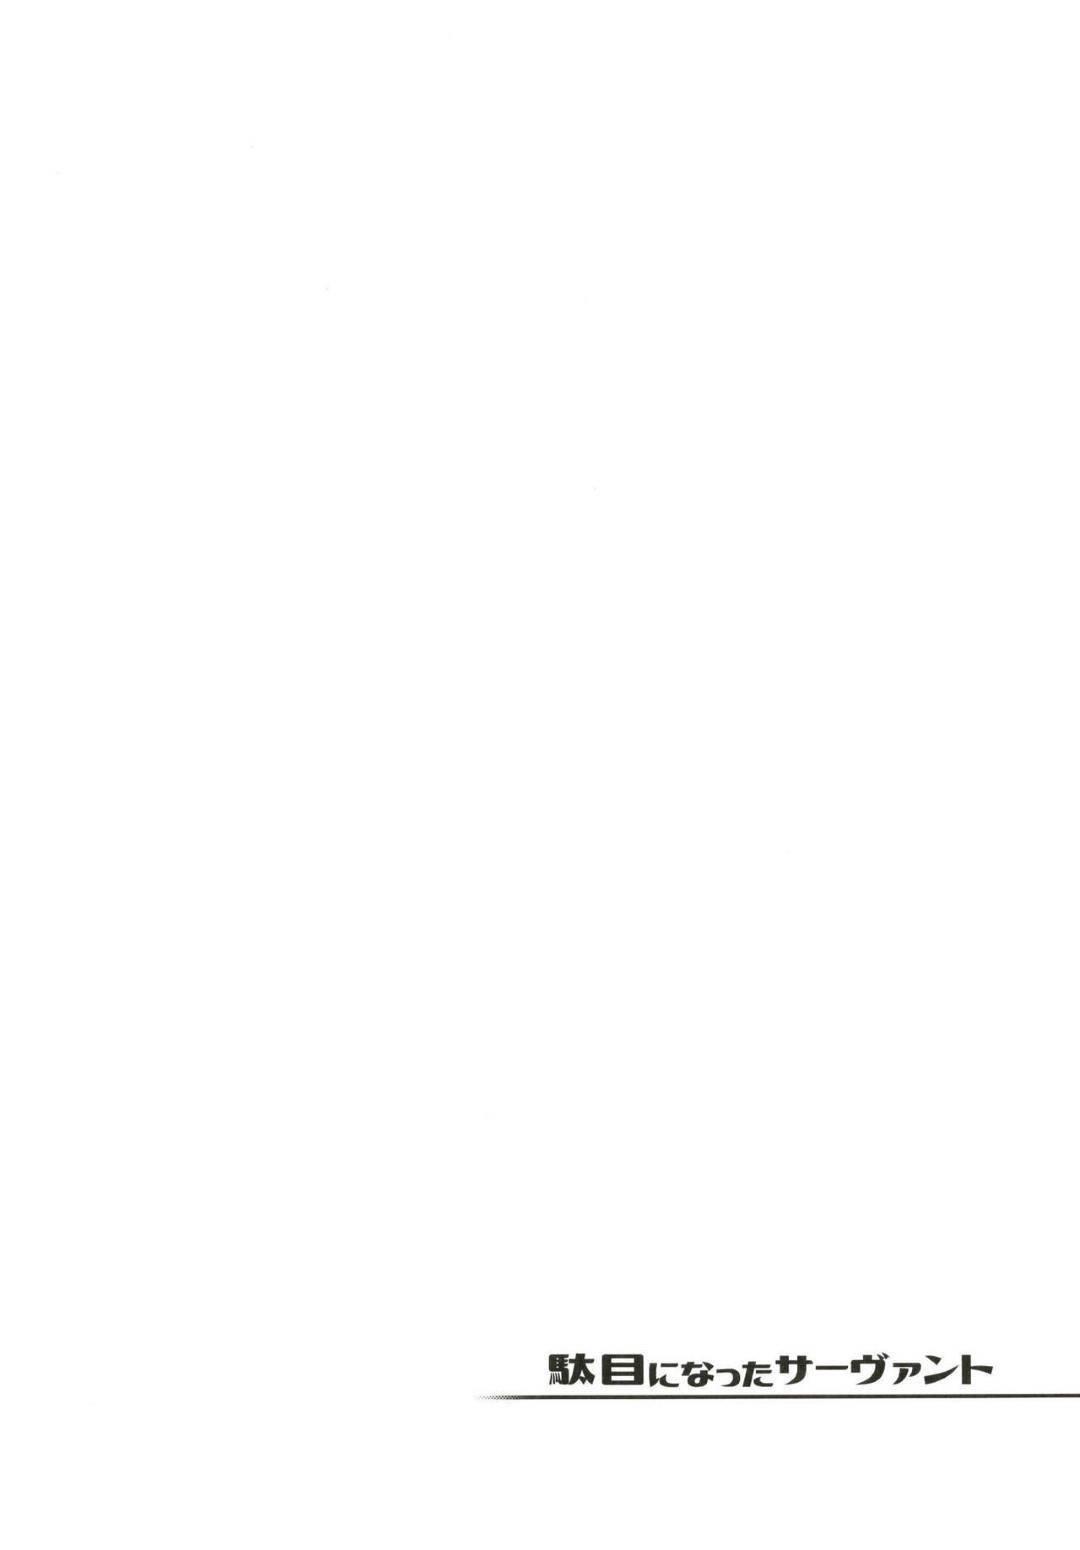 【Fateエロ漫画】刑部姫にヤリ部屋へと招かれたガネーシャ。困惑する彼女にお構い無しで男たちは彼女を取り囲んでチンポを次々と挿入し乱交セックスへ発展。ムチムチ状態に変化させられた彼女はチンポにヨガりまくって快楽堕ちする。【KANZUME】